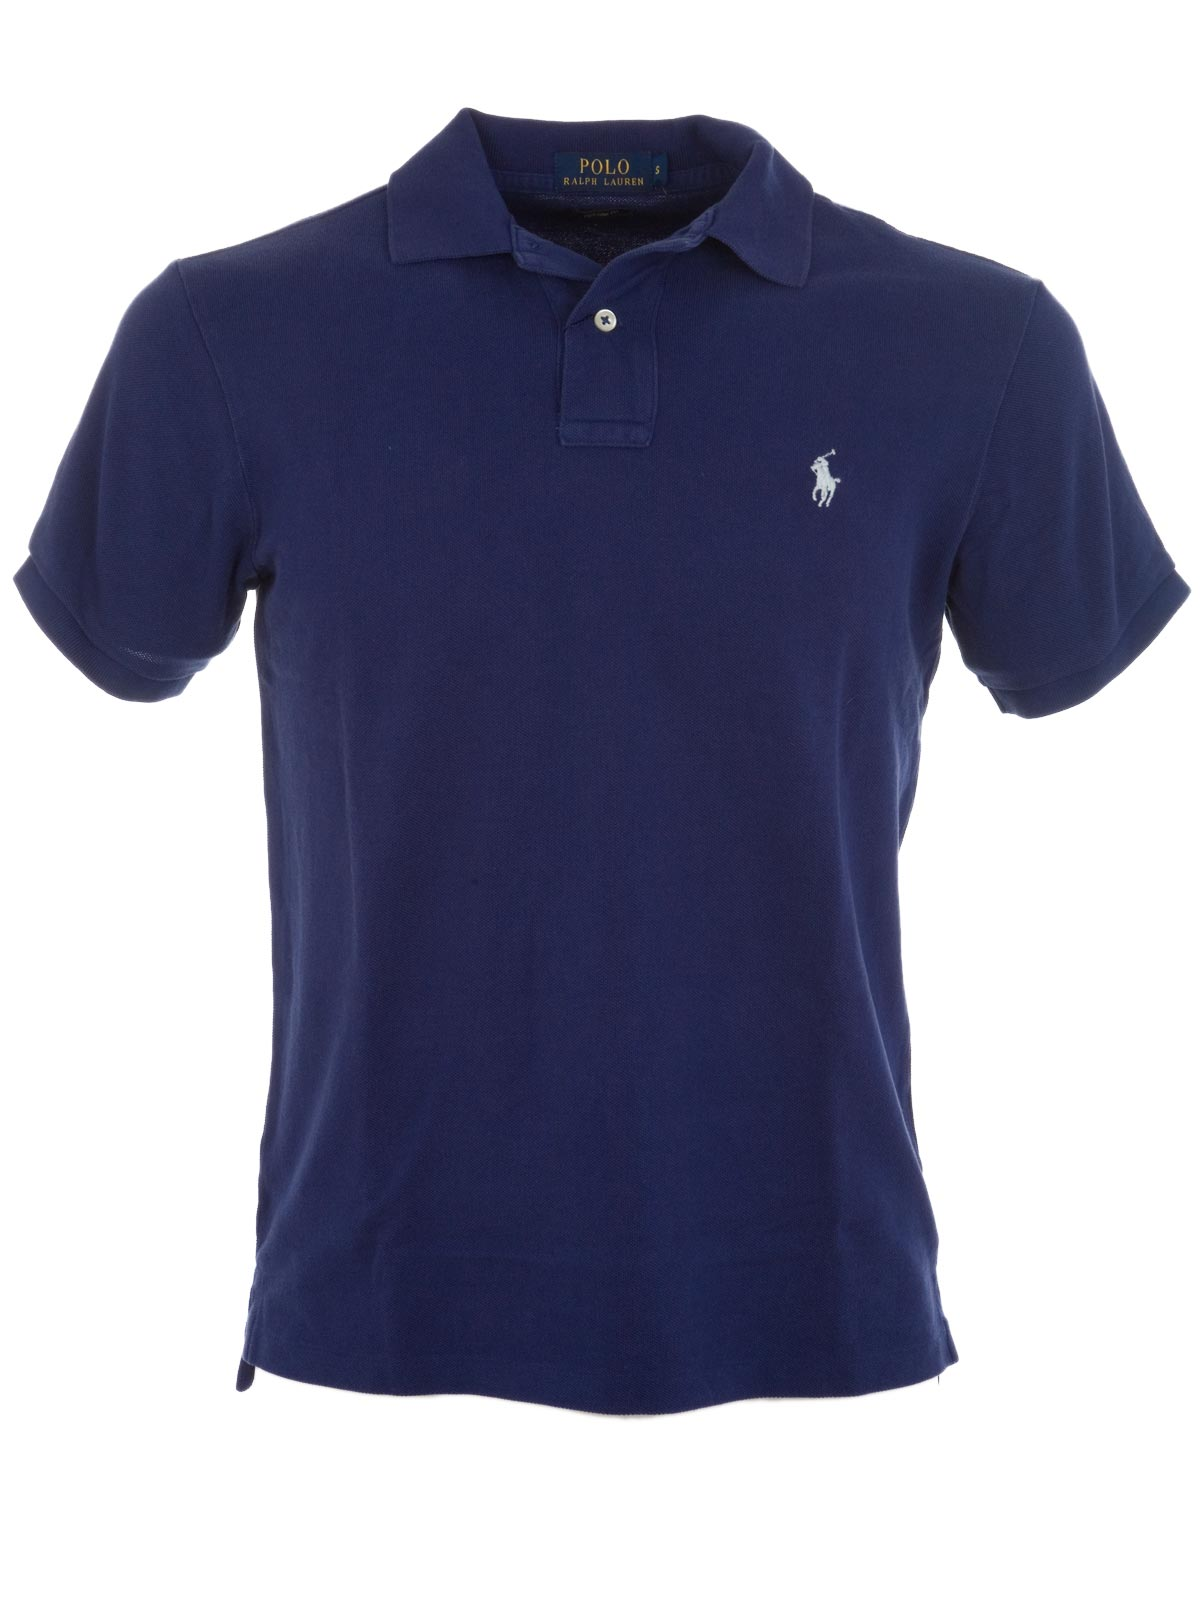 Polo ralph lauren custom fit polo shirt xw7m3 for Polo ralph lauren custom fit polo shirt